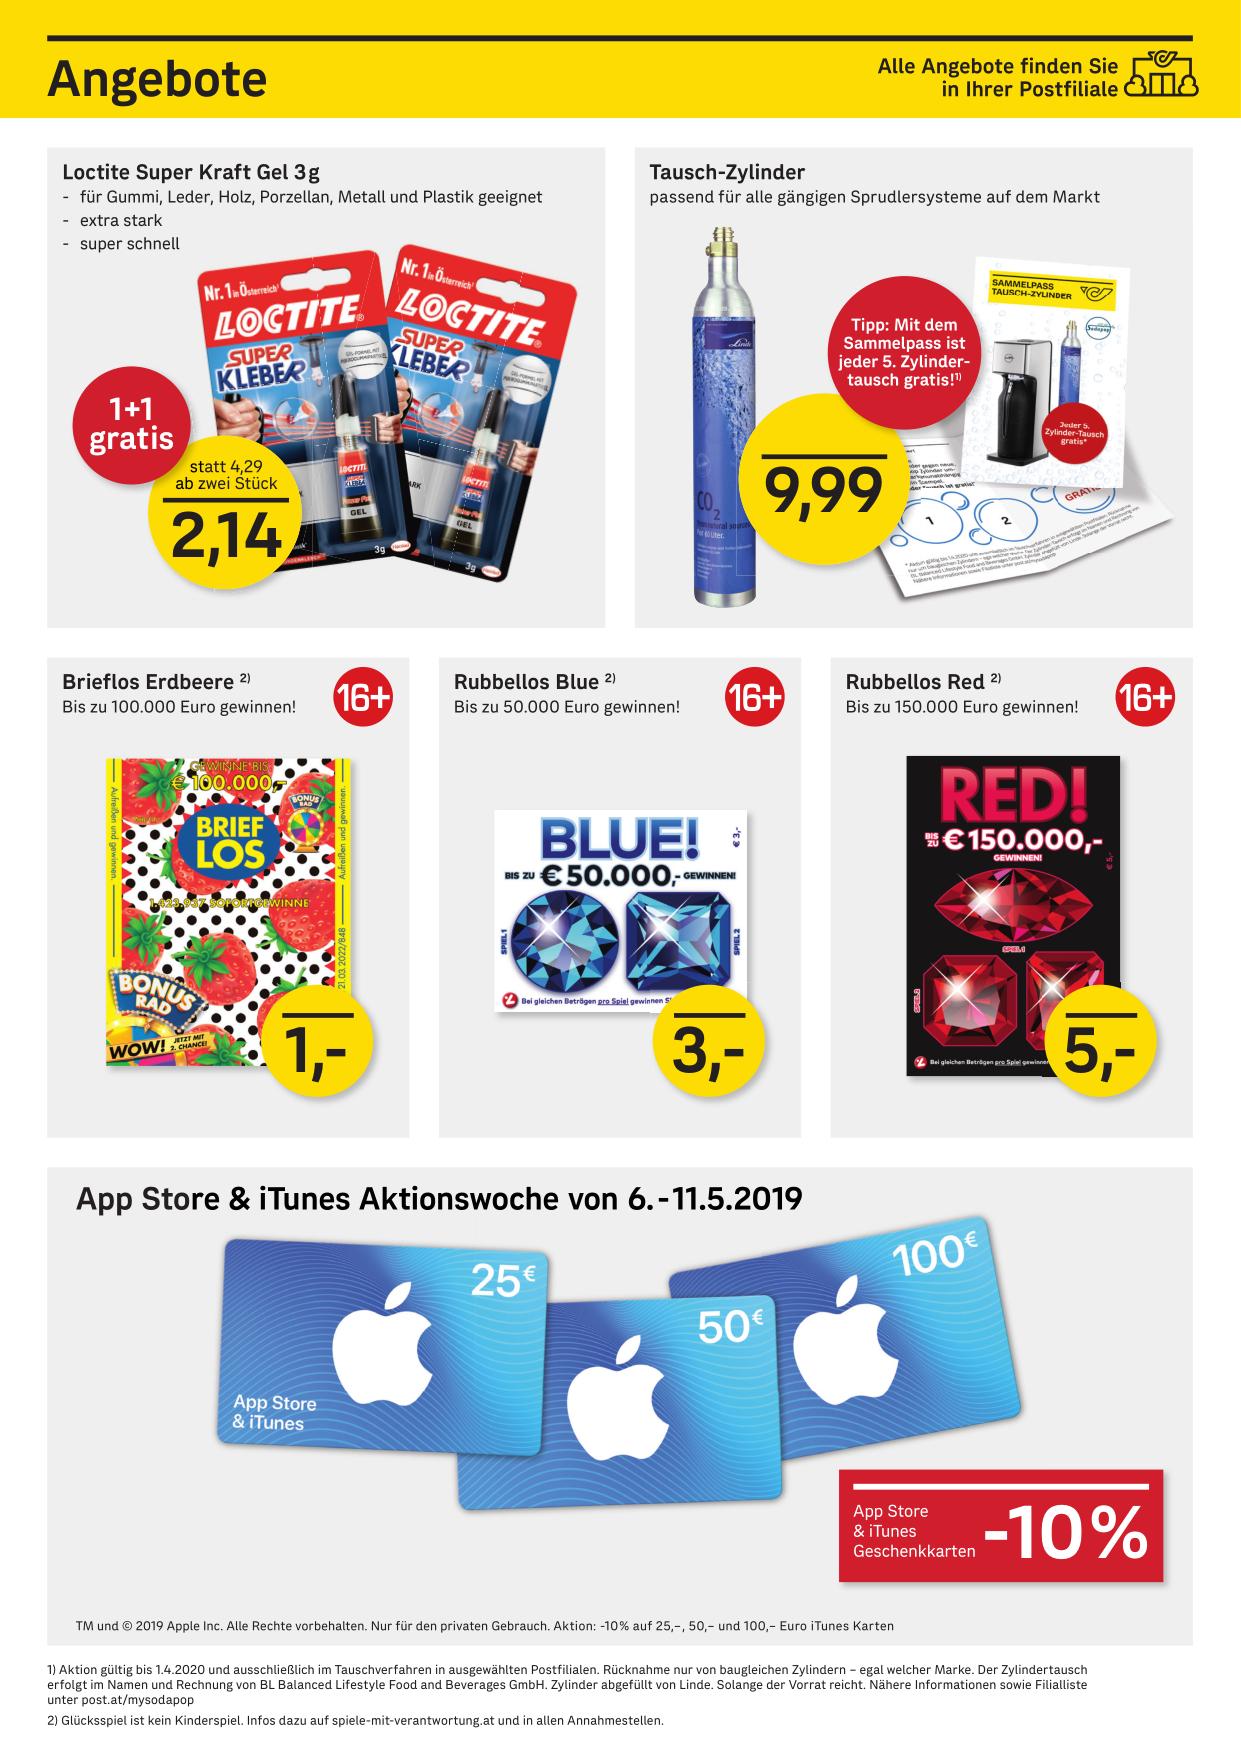 10% Rabatt auf App Store & iTunes Karten bei der Post